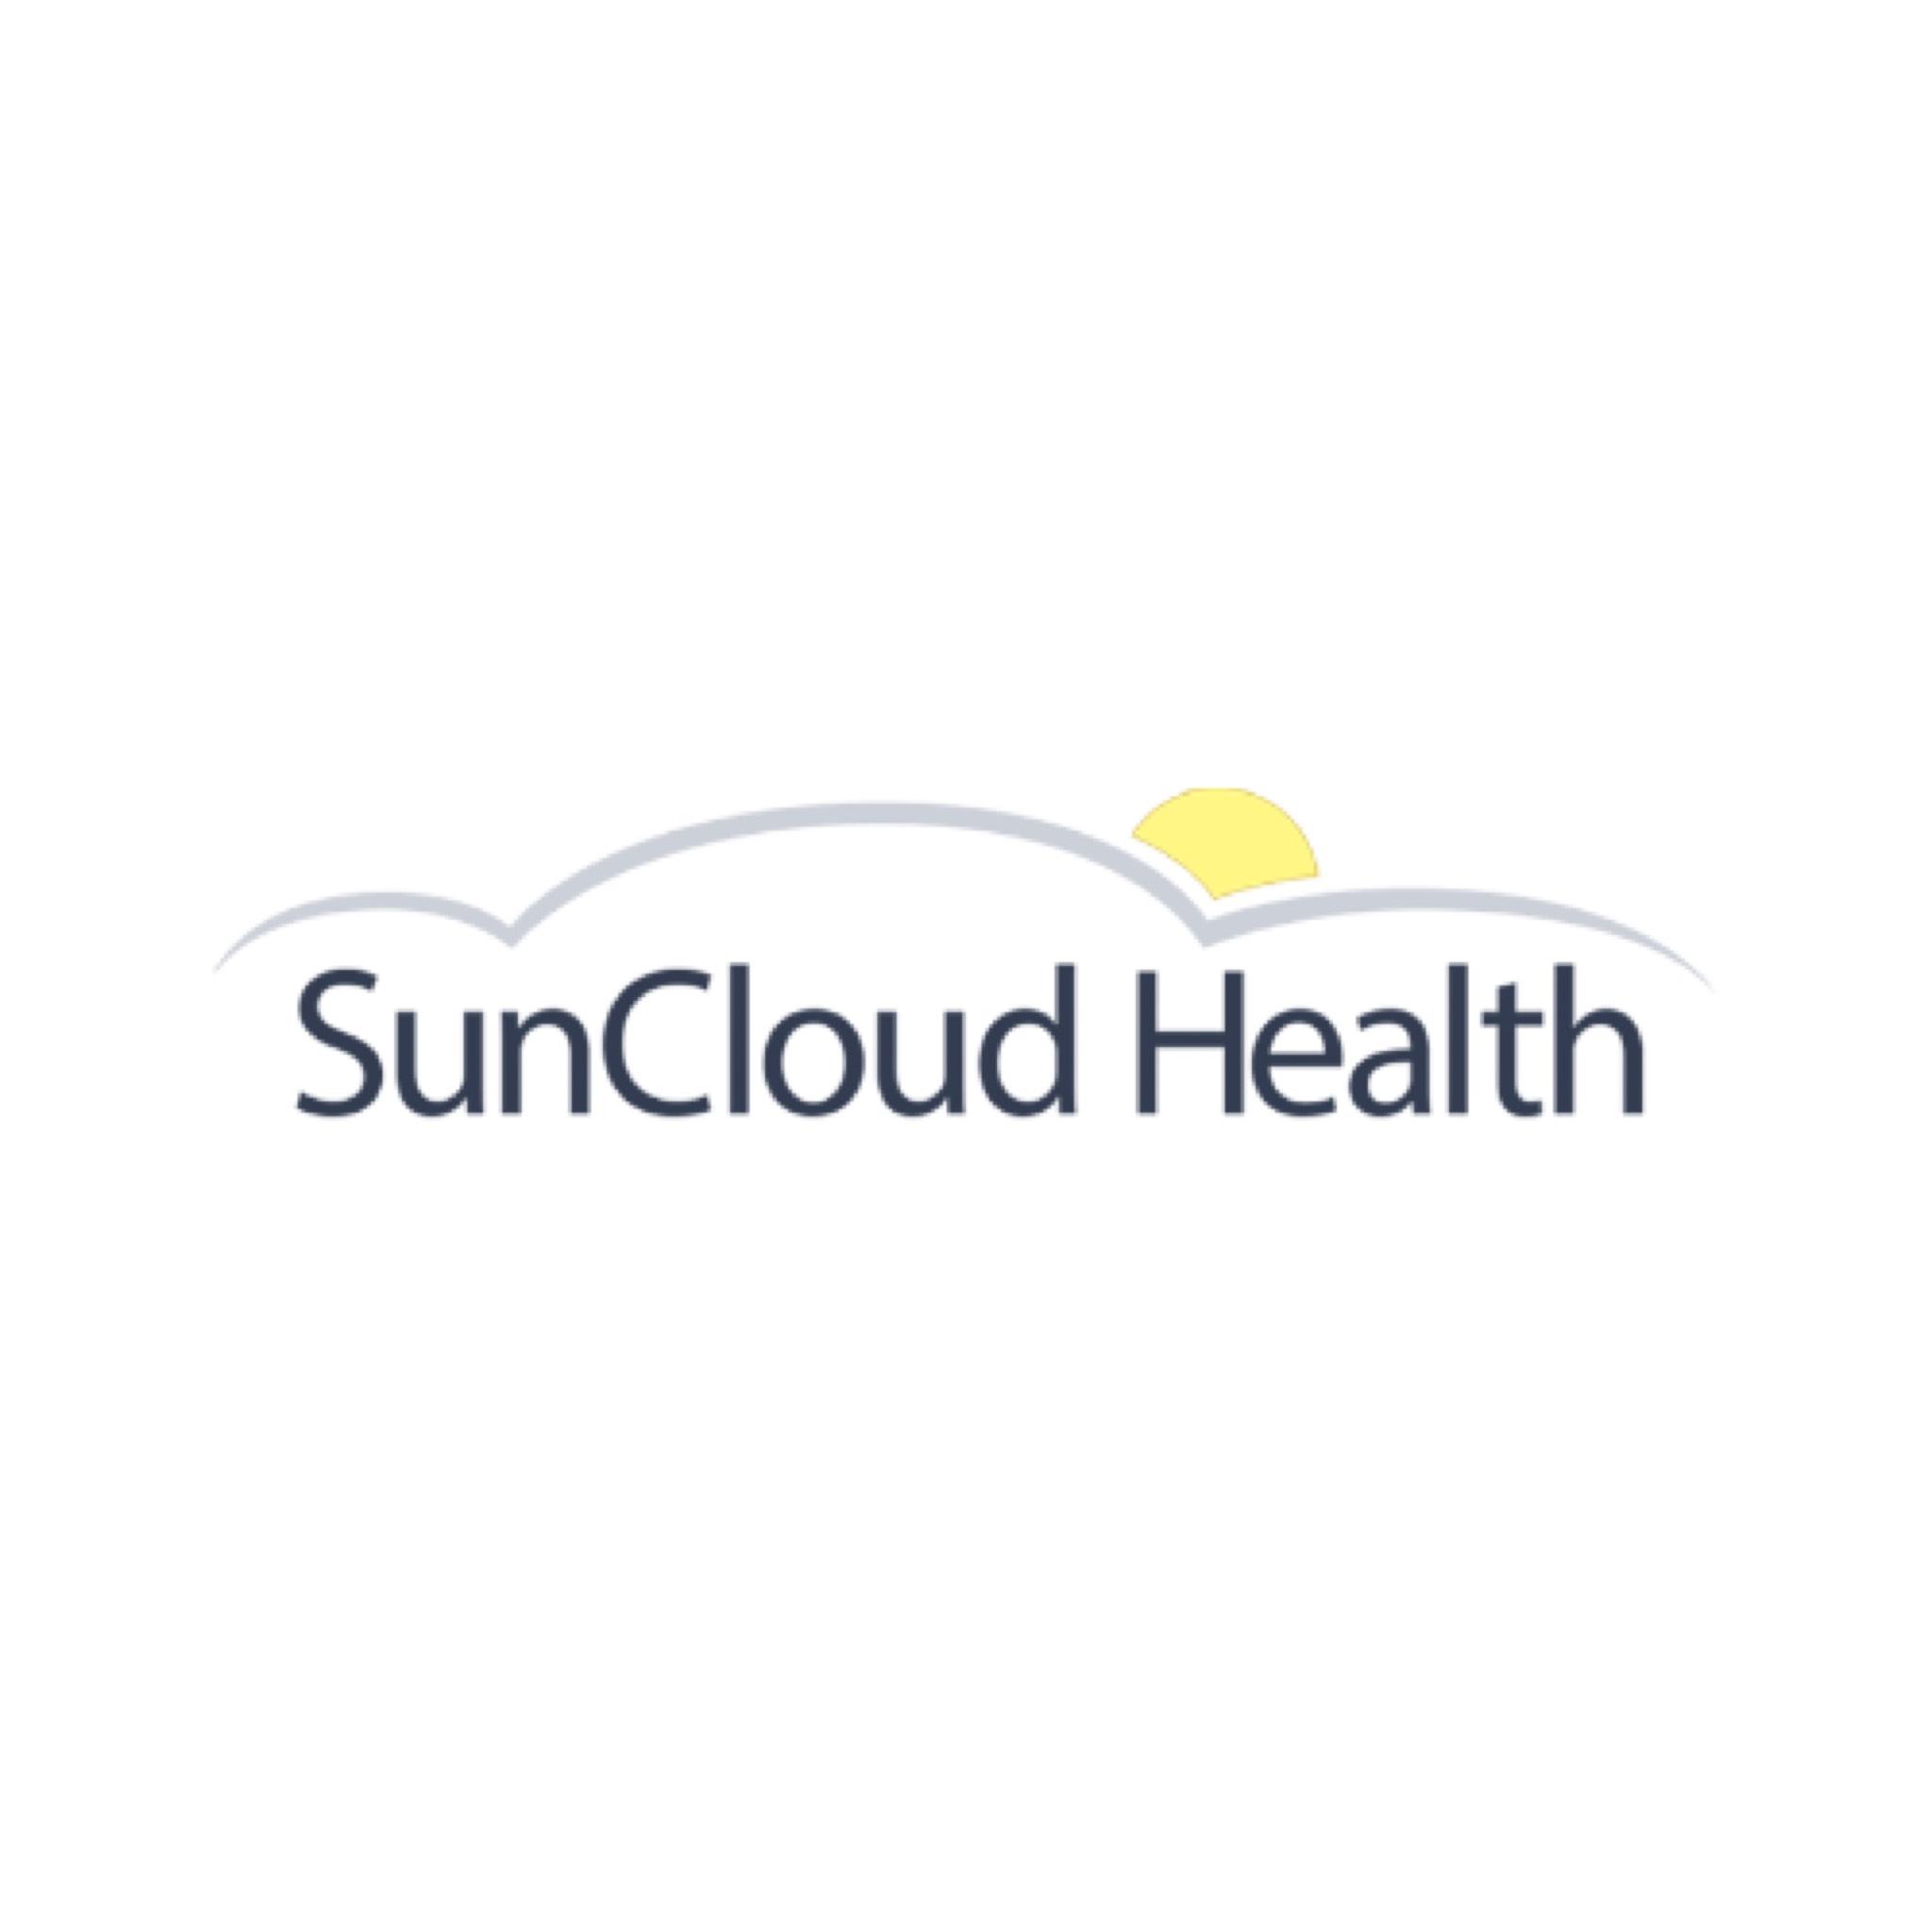 SunCloud Health